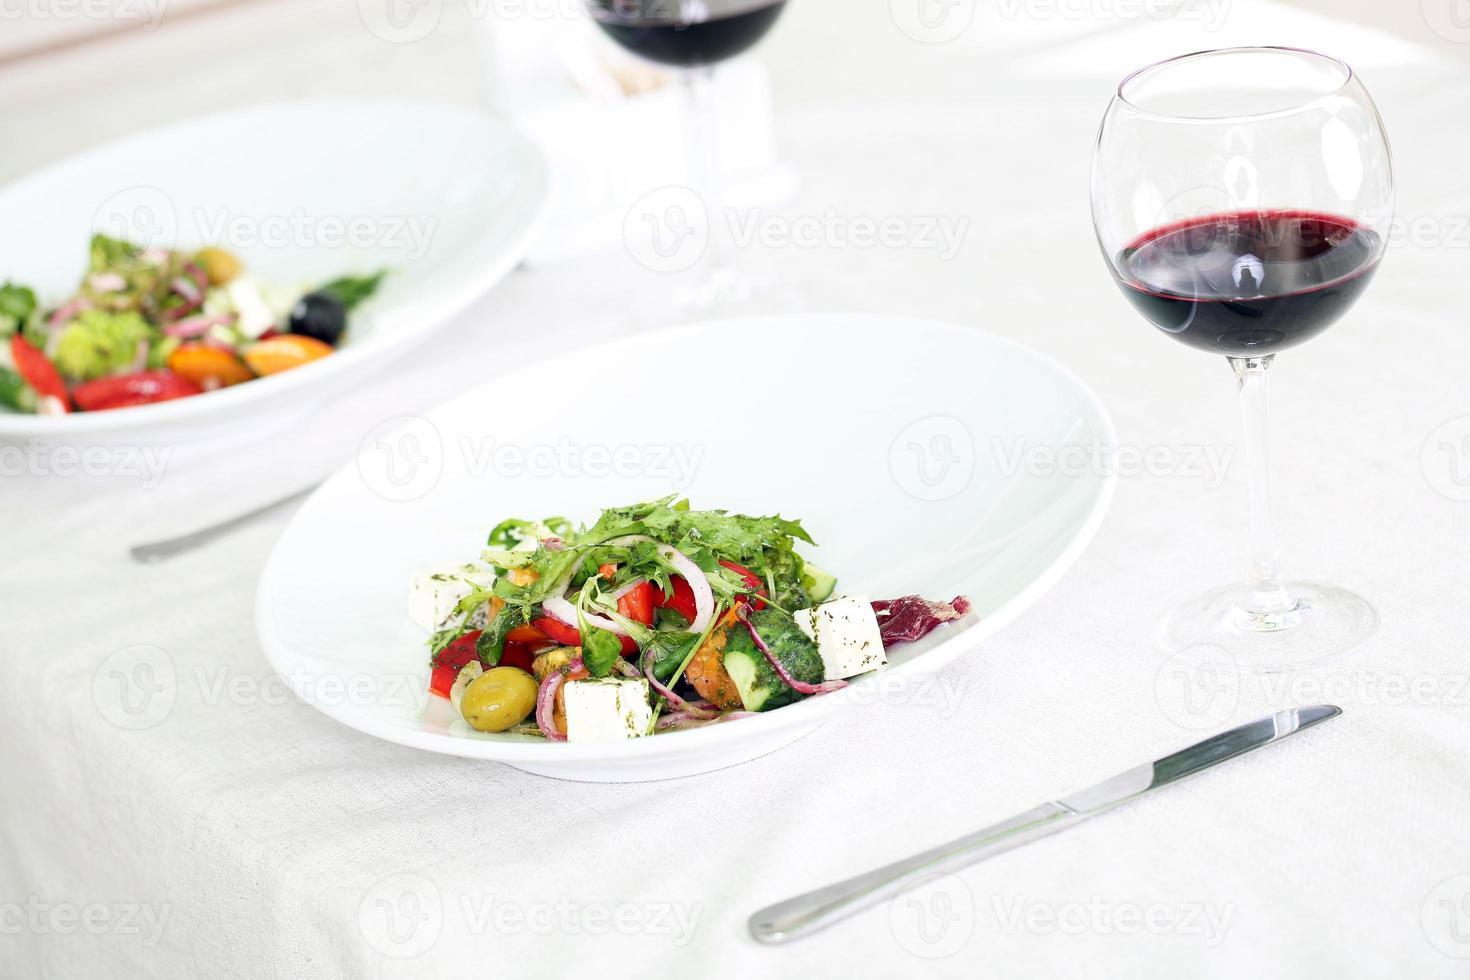 Griekse salade op witte plaat, close-up foto